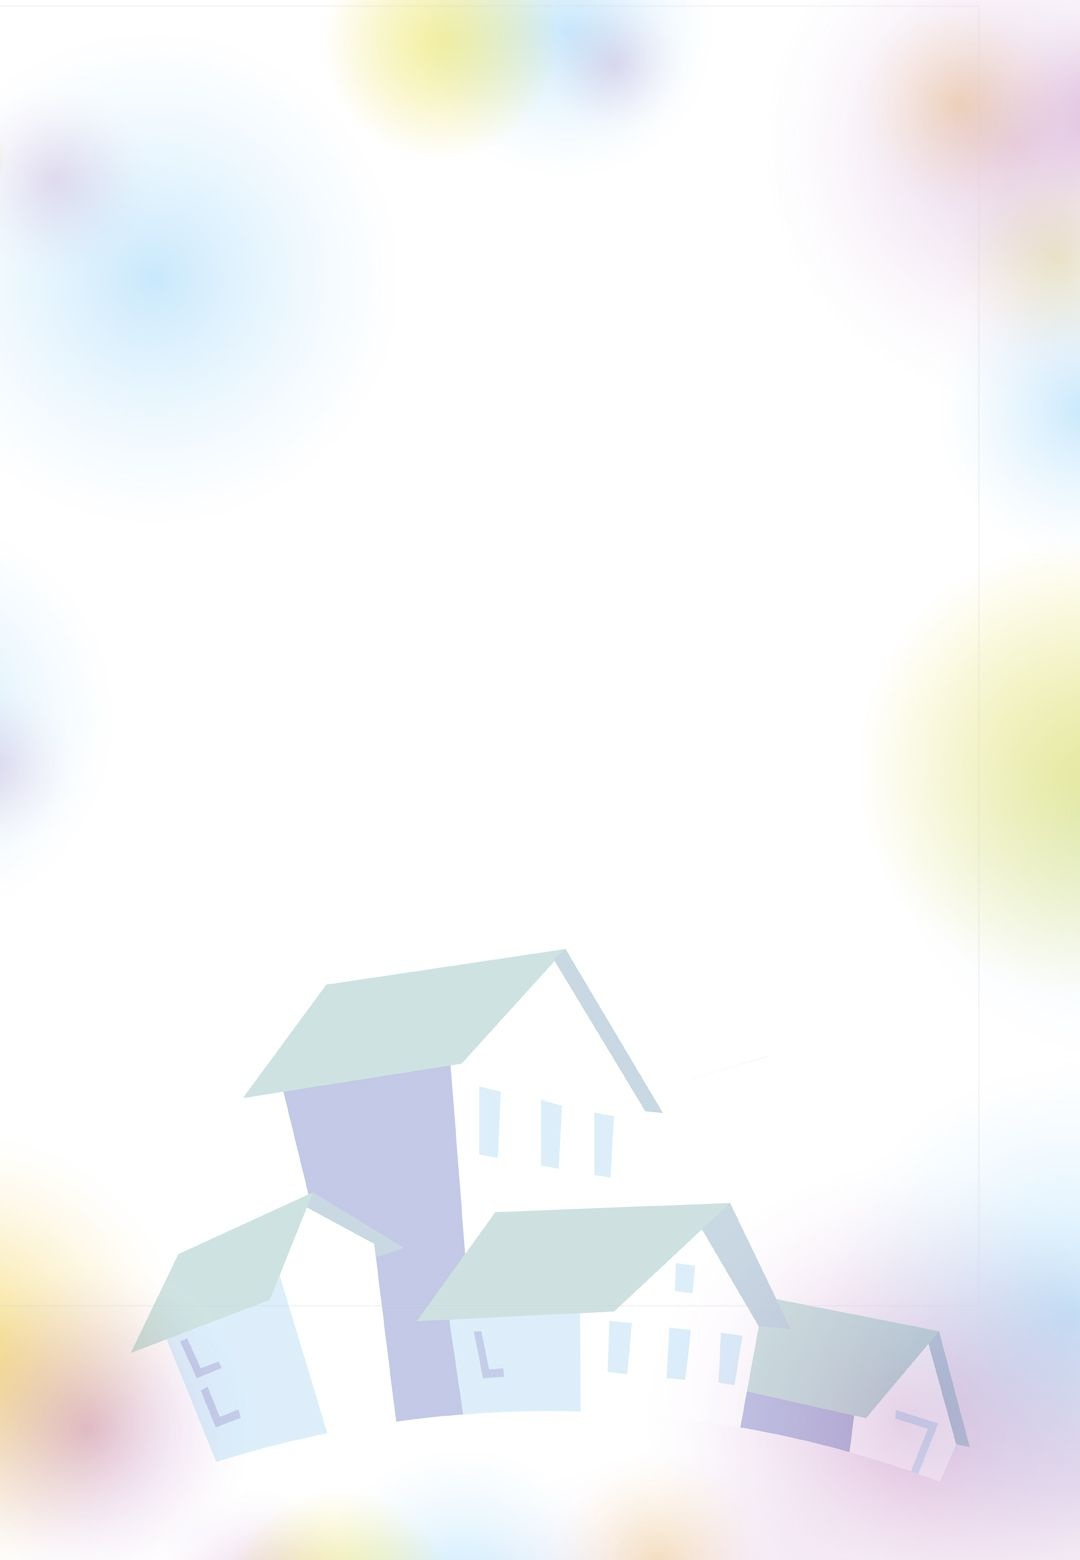 Housewarming Invitation Free Printable | Parties | Holidays - Free Printable Housewarming Invitations Cards